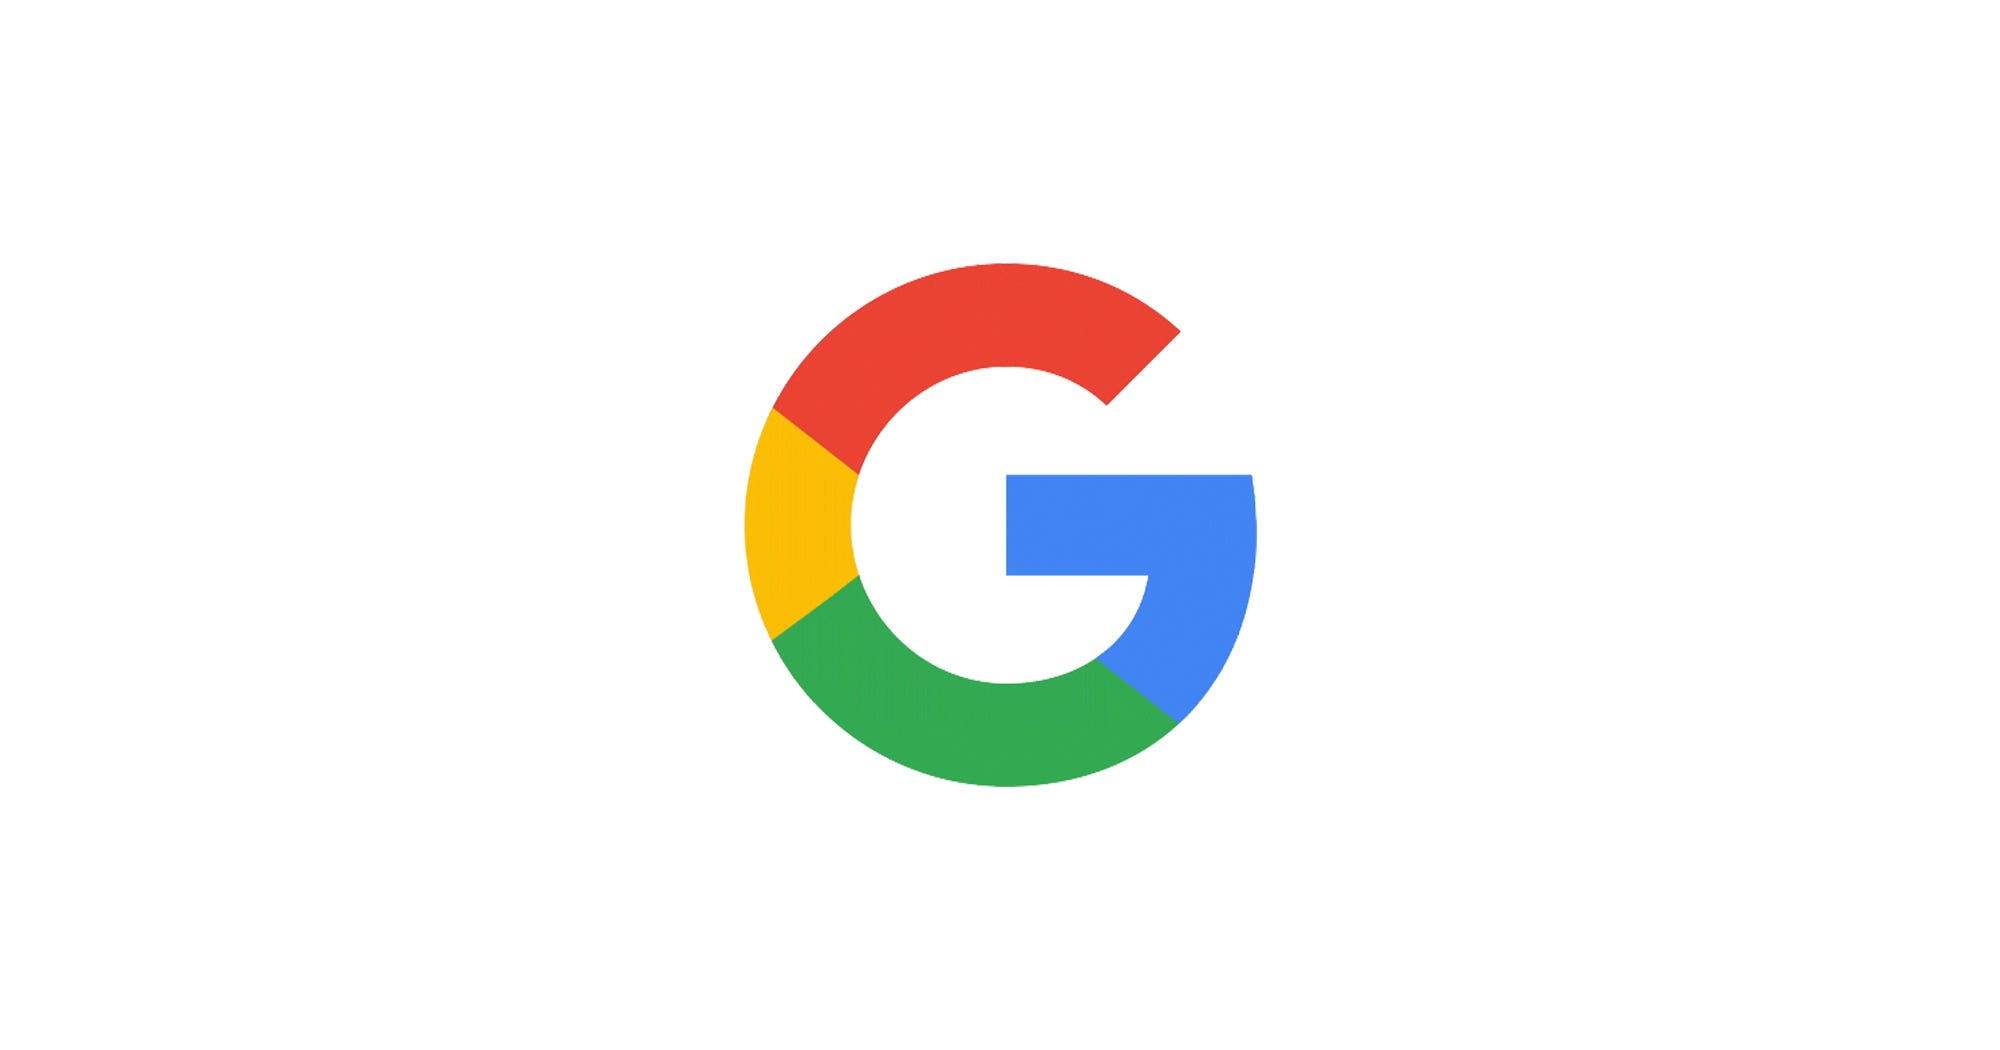 Edmonia Lewis Google Doodle Black History Month 2017